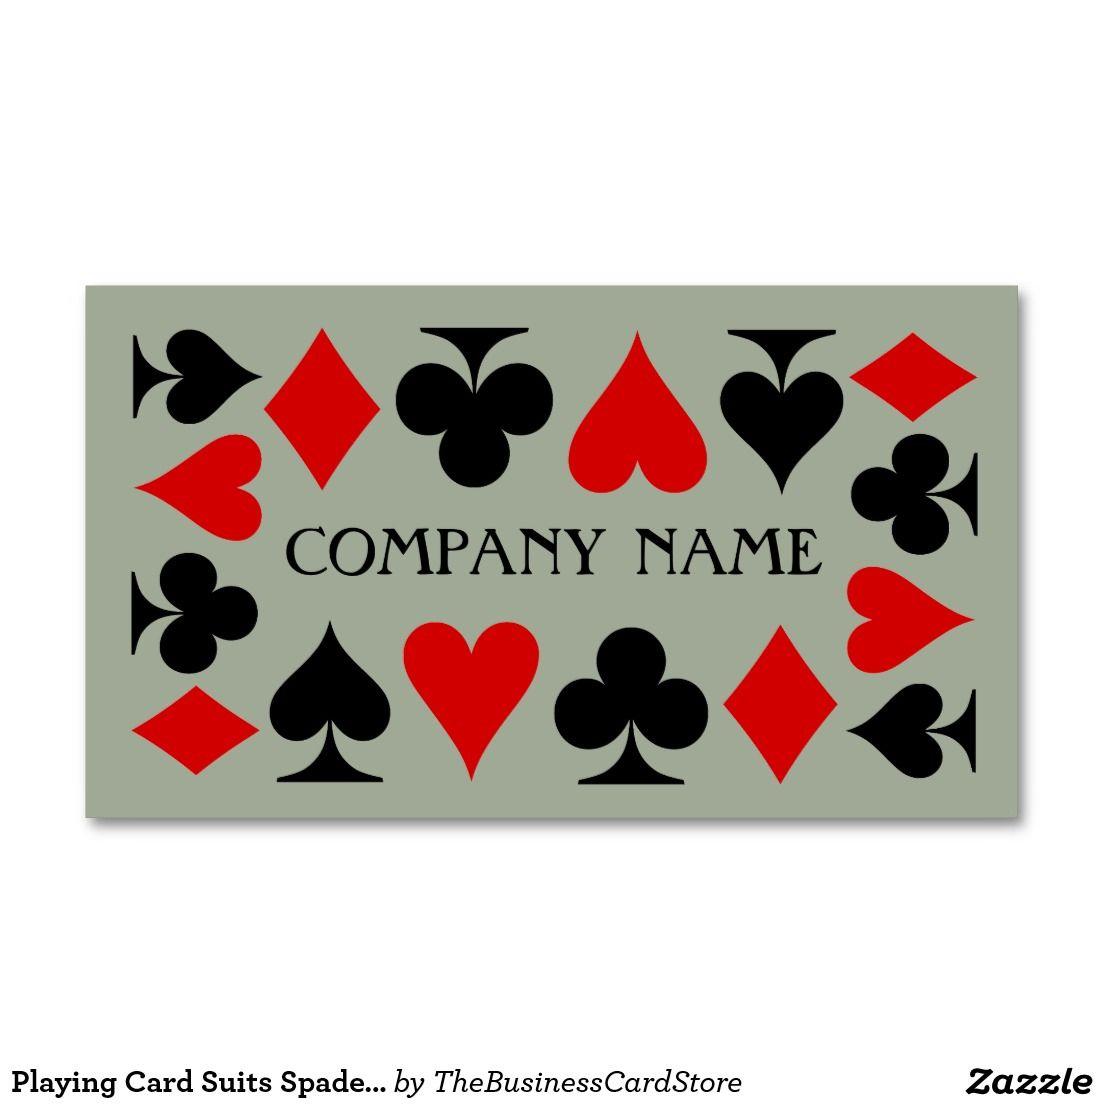 Playing card suits spade heart club diamond business card games playing card suits spade heart club diamond business card magicingreecefo Gallery